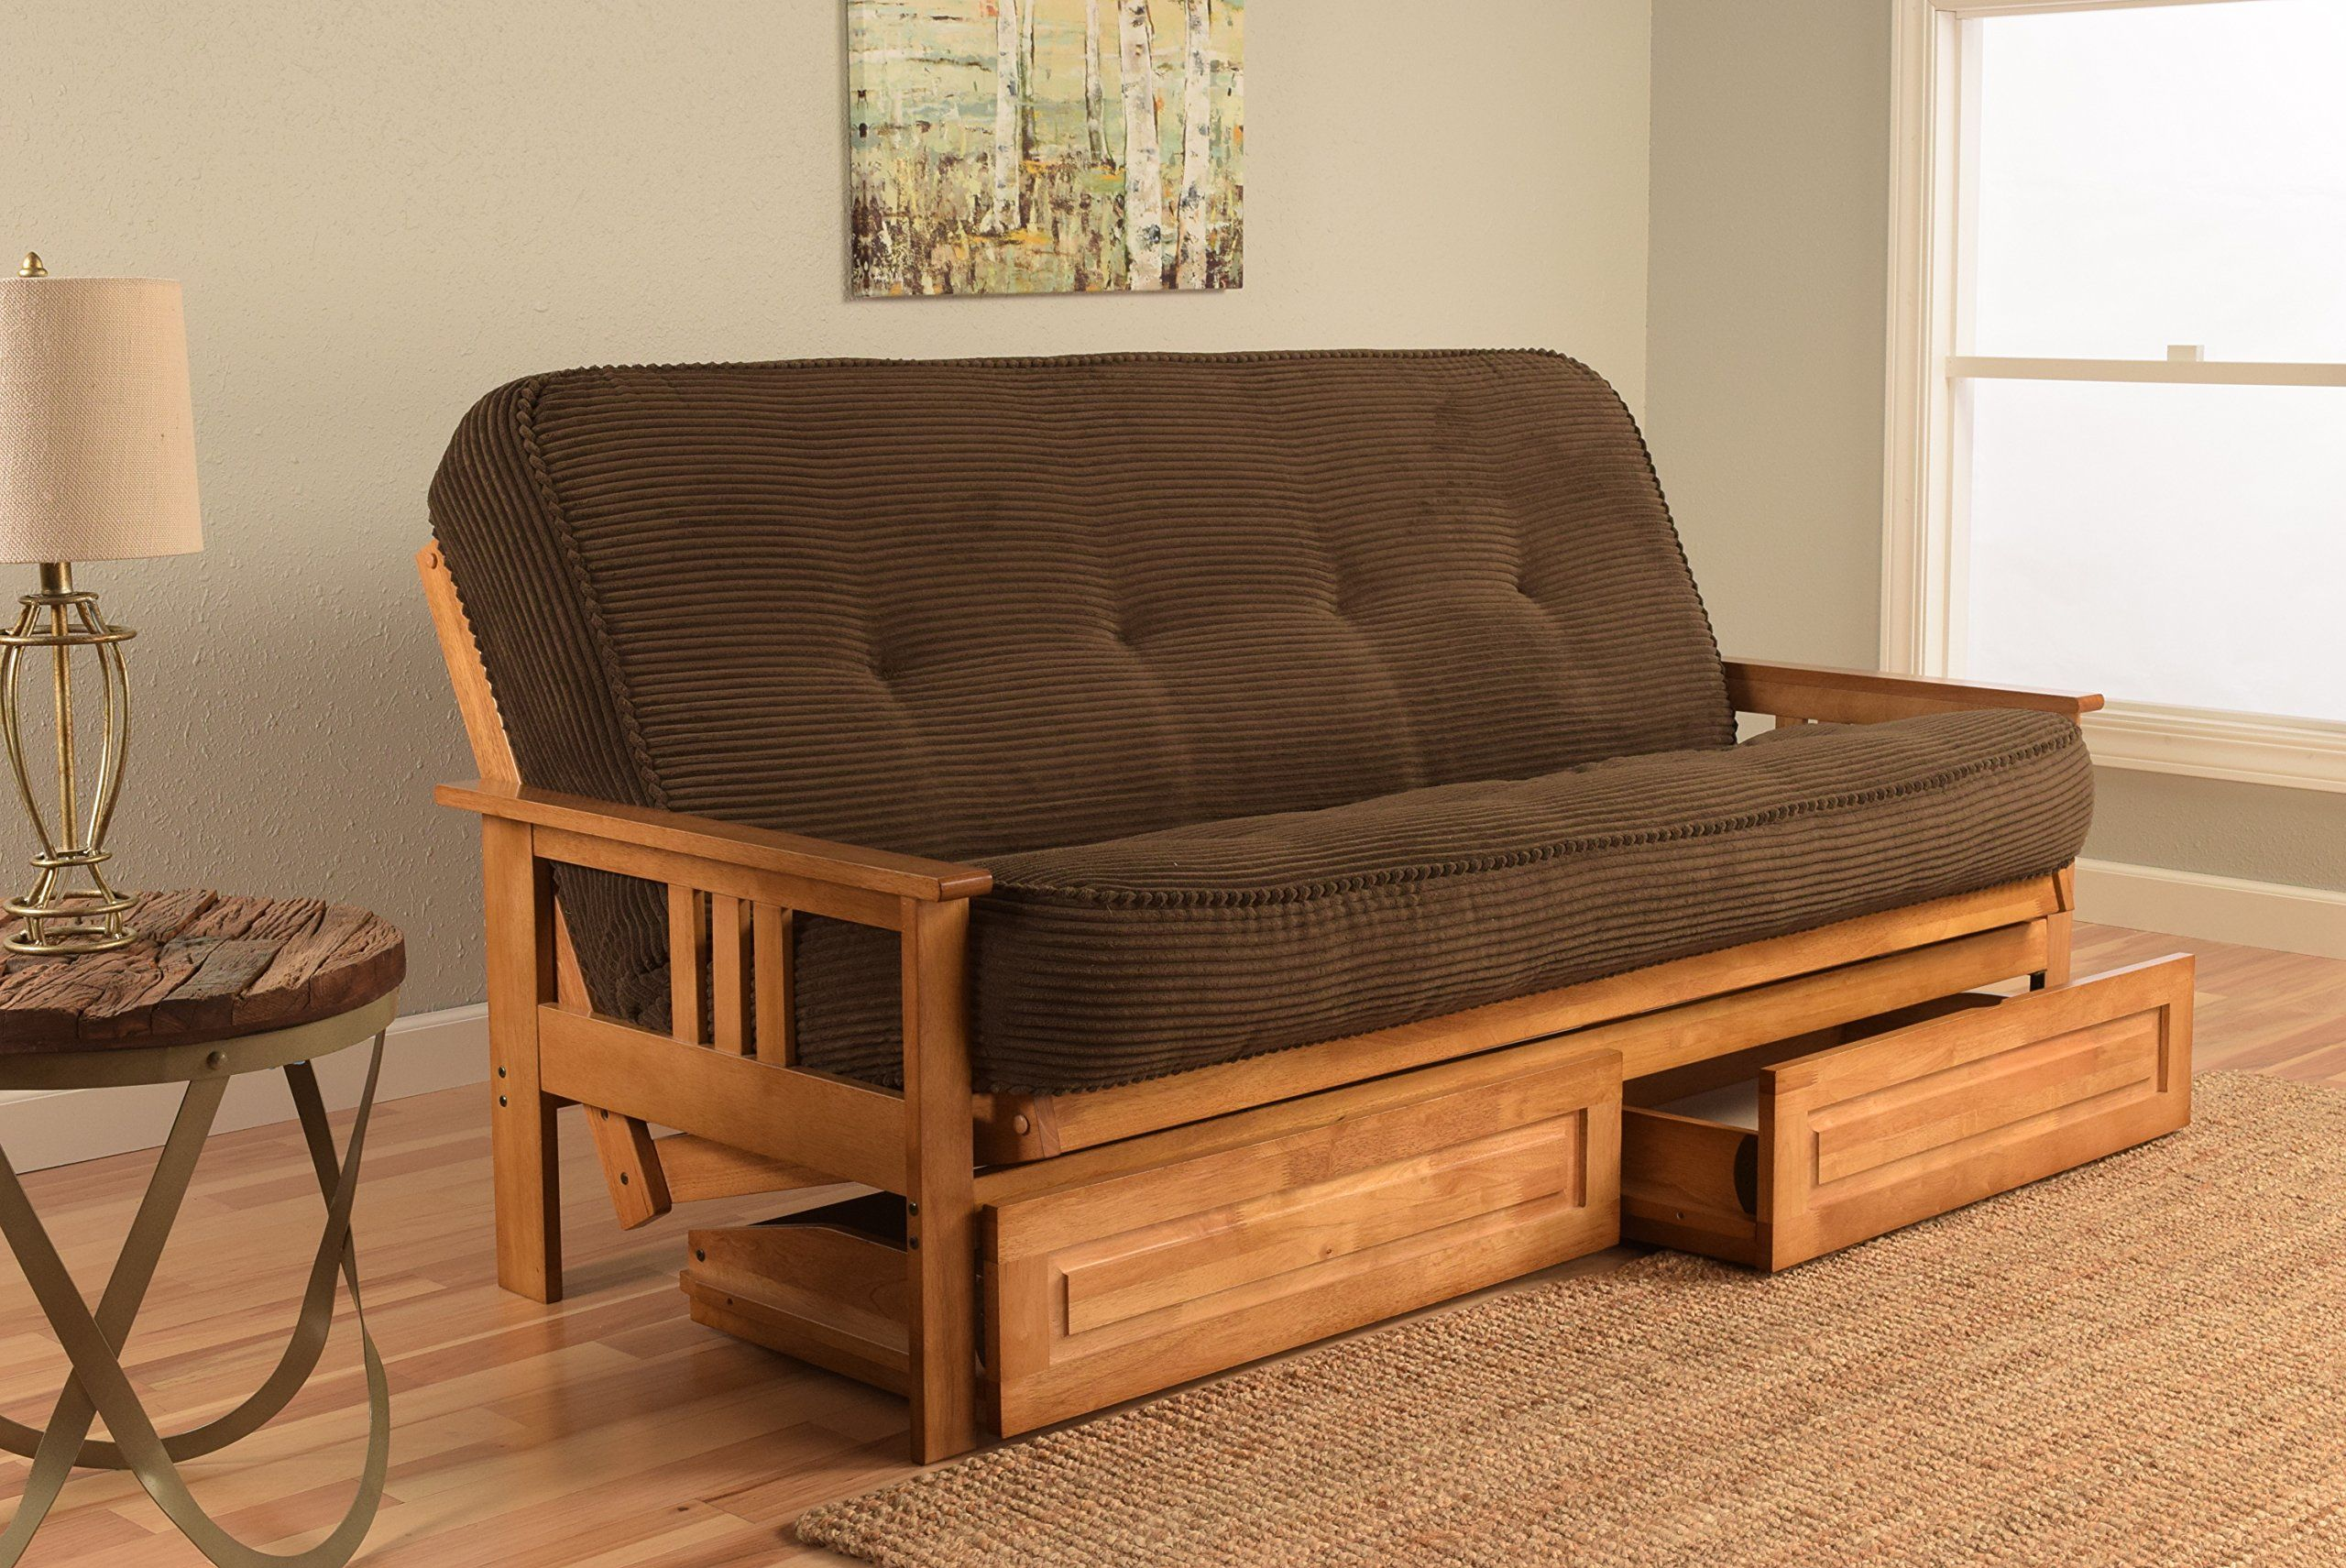 Kodiak Furniture Kfmodbttesplf5md4 Monterey Futon Set With Ernut Finish And Storage Drawers Full Tantra Espresso